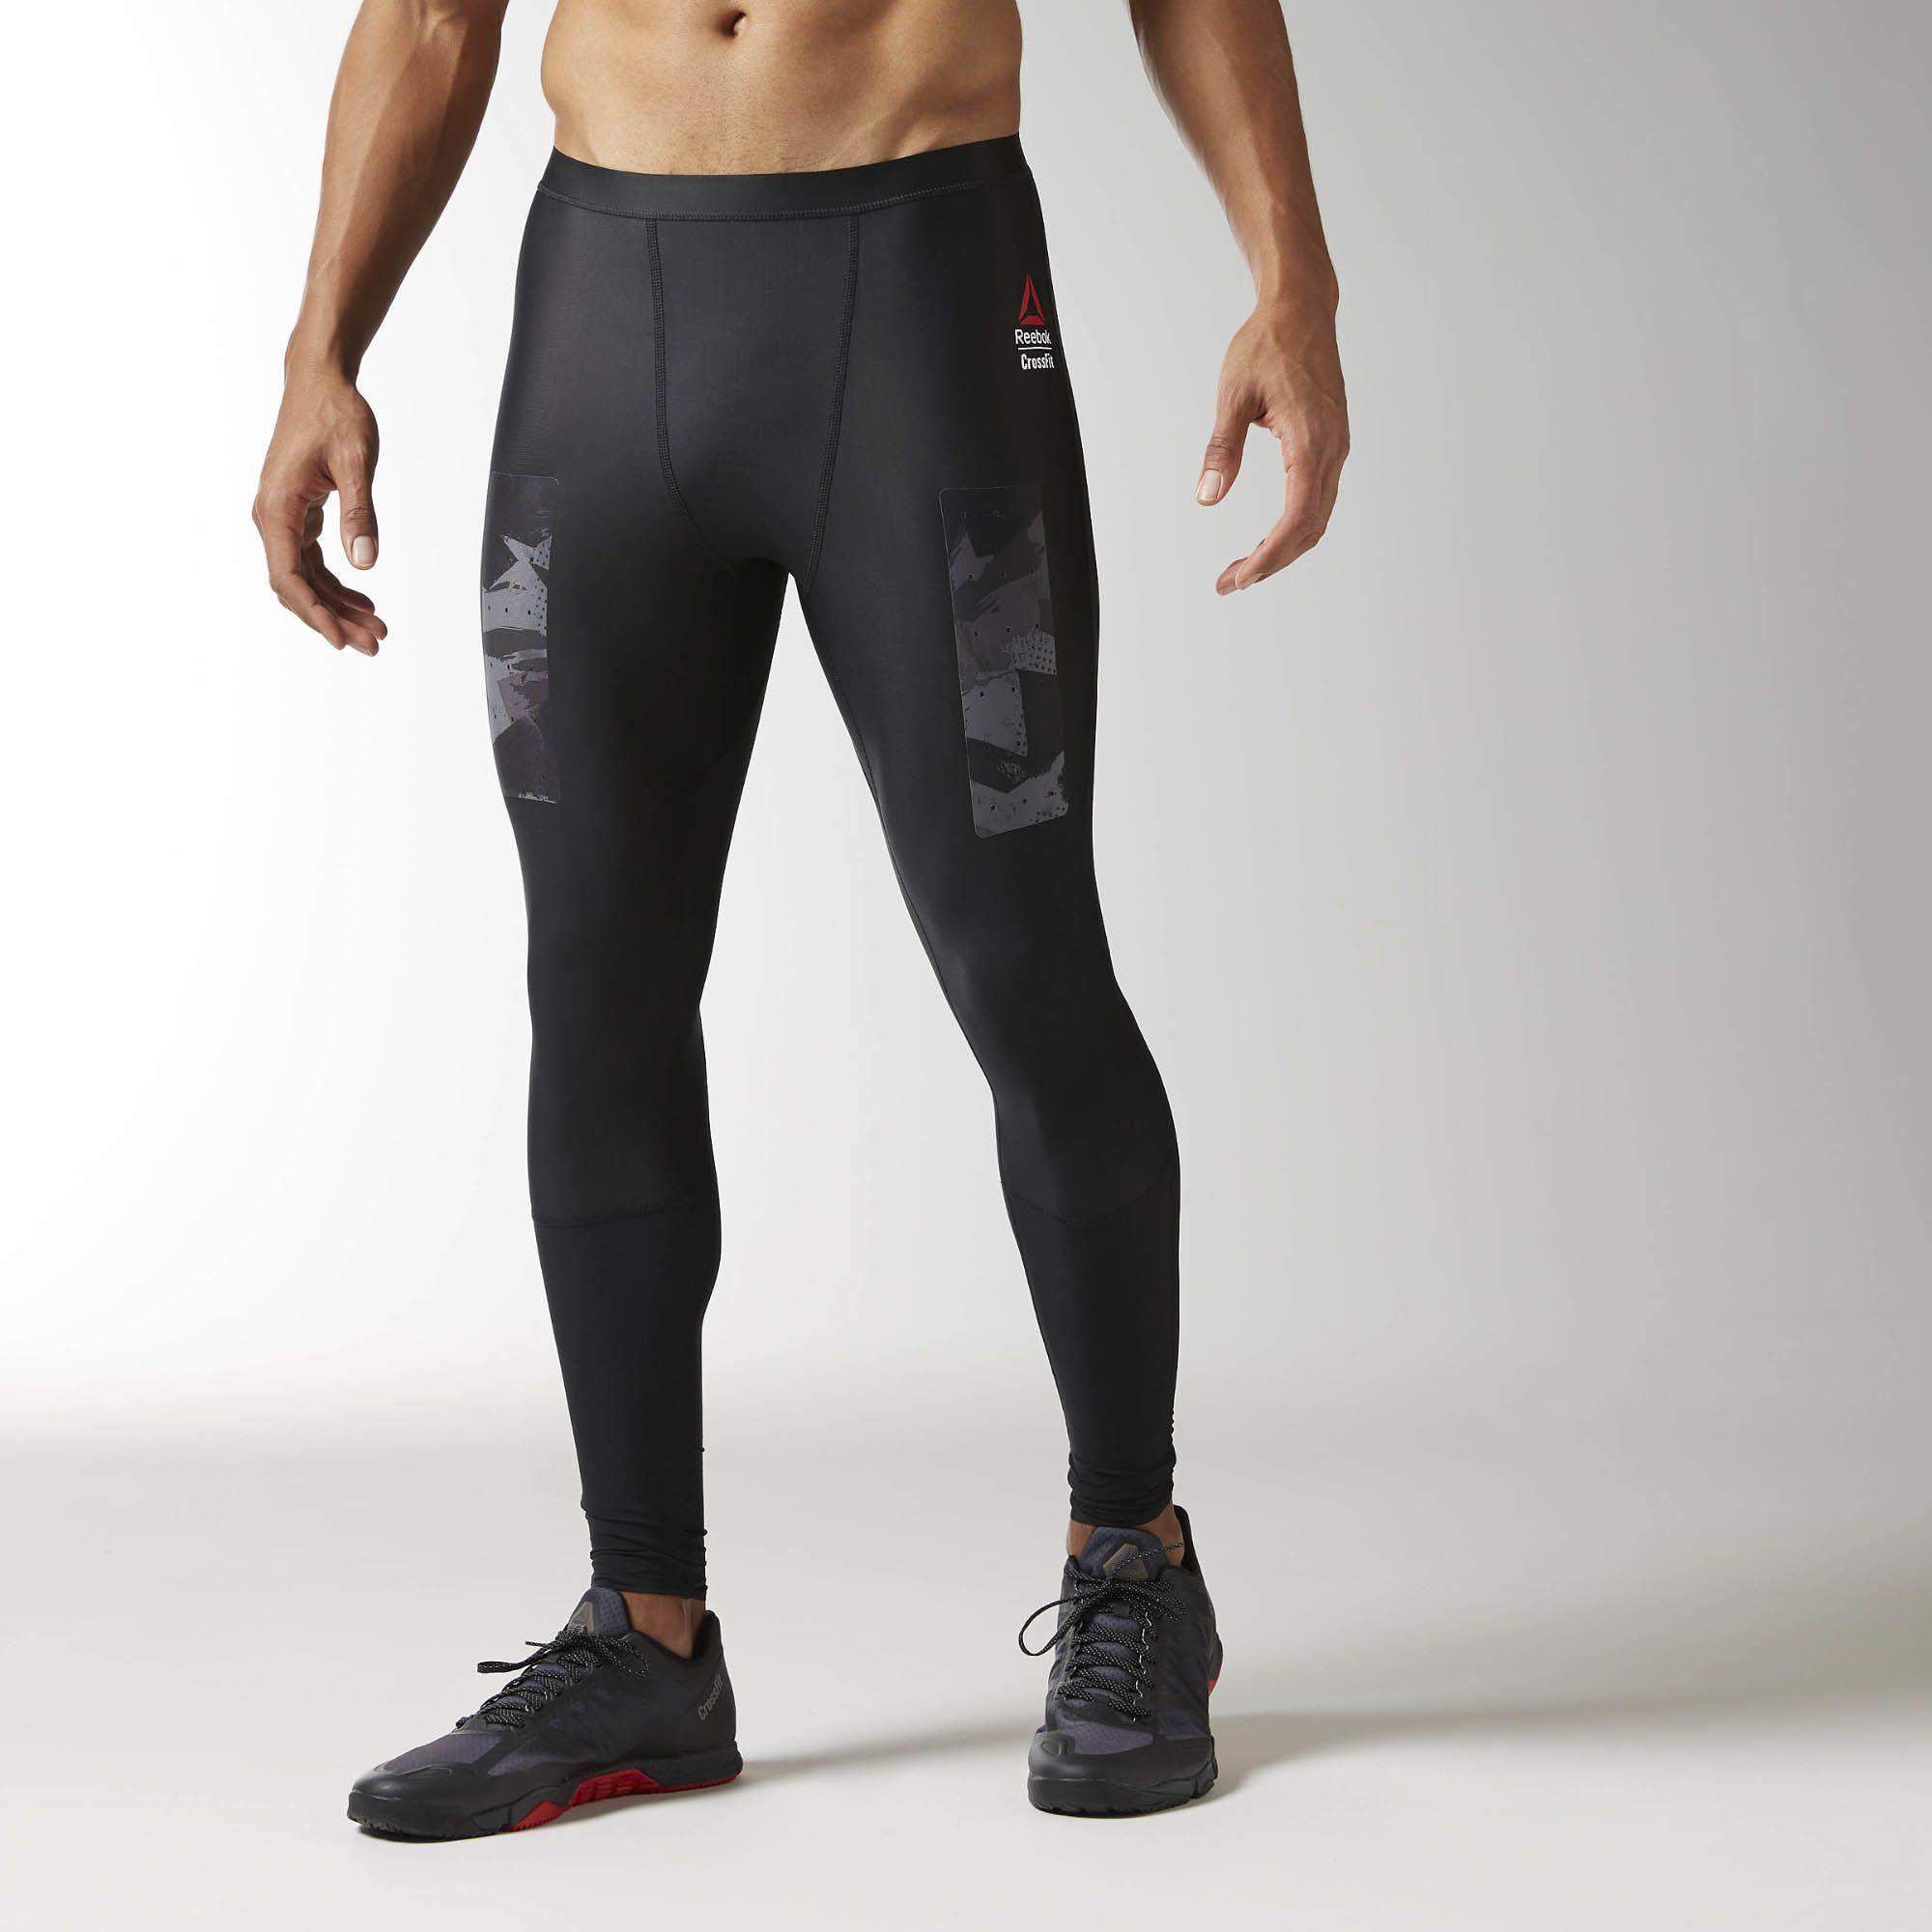 Reebok - Pantalón Reebok CrossFit Compression Pant   Buyersvlub 2016 ... ef490e797ab9